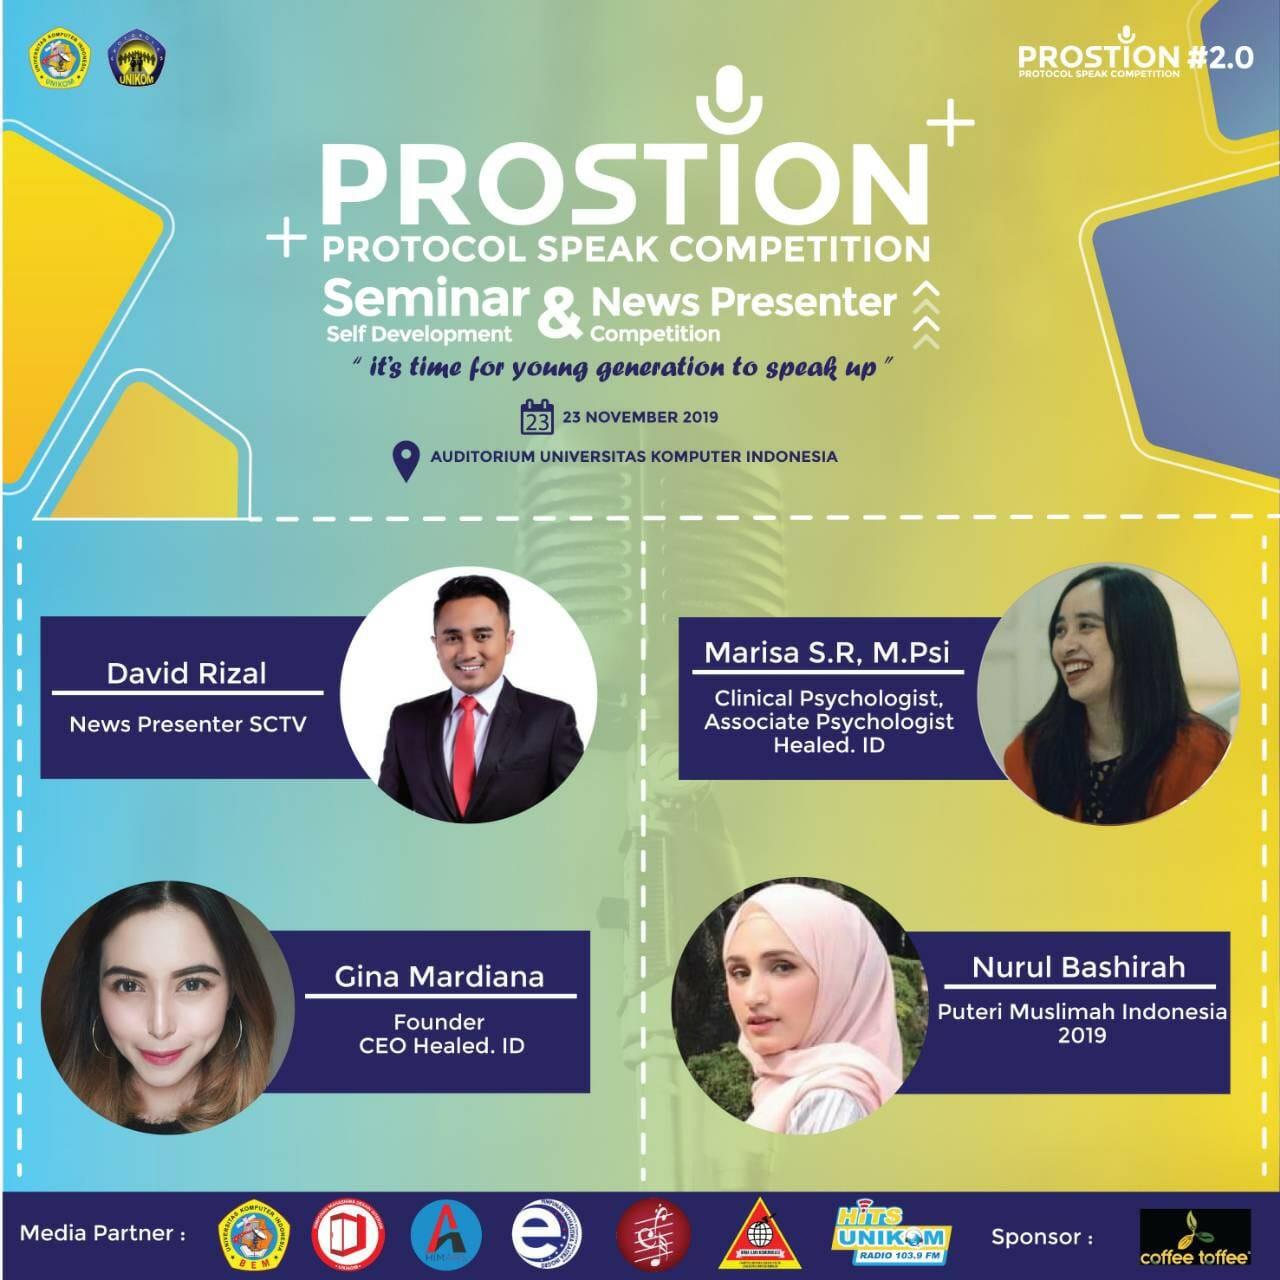 Protocol Speak Competition (Prostion) #2.0